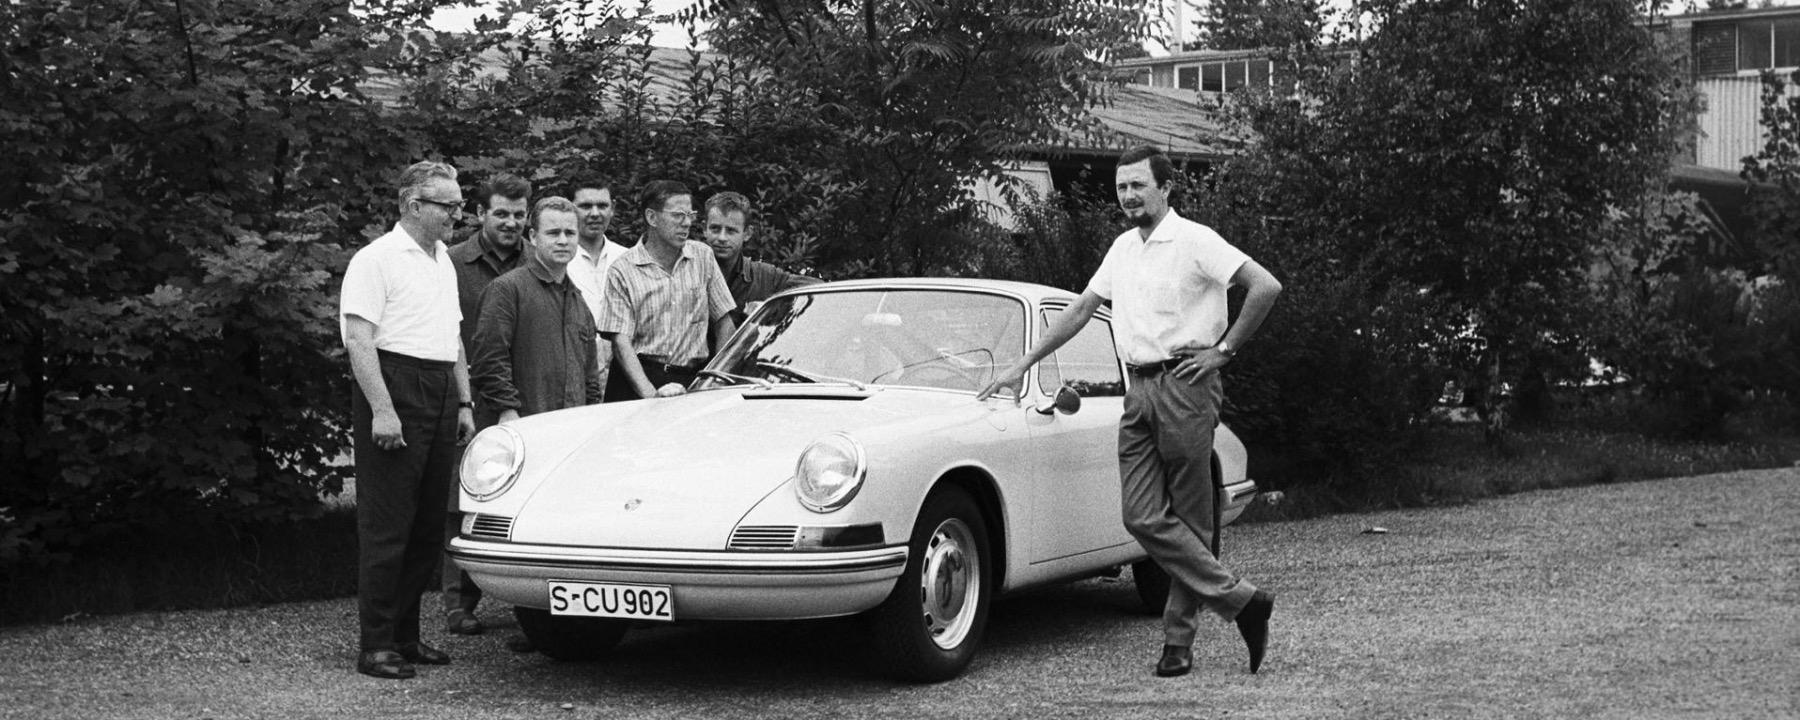 A Milestone Year: Porsche Turns 70 - Baker Motor Company on susanne porsche, erwin komenda, ferdinand oliver porsche, ferdinand alexander porsche, porsche family, zell am see, franz josef popp, ferdinand porsche, siegfried marcus,